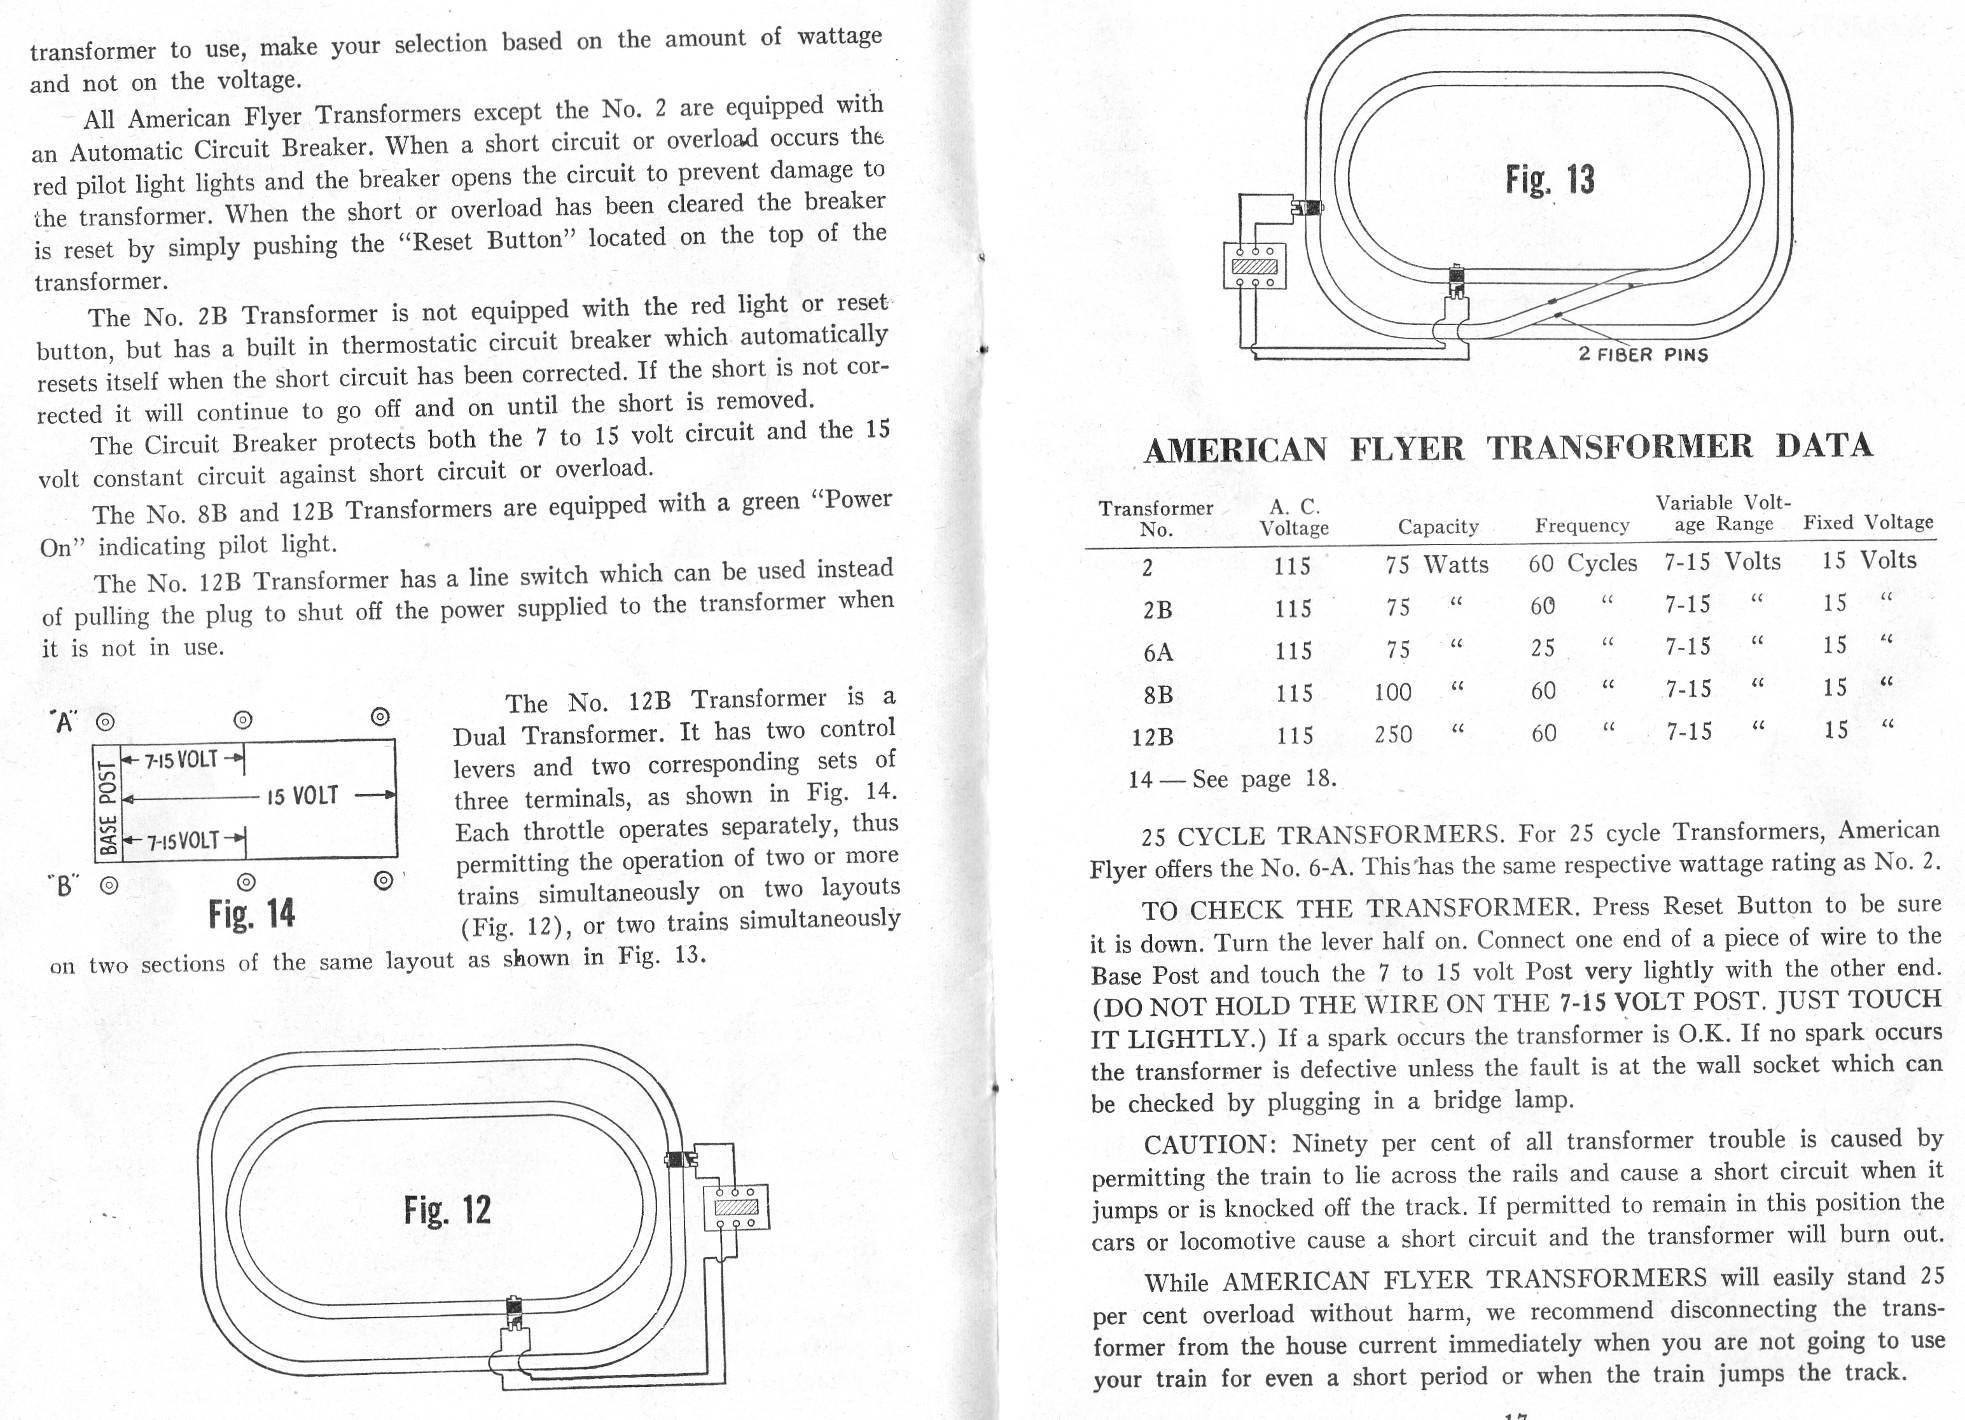 Transformer Power Supply and Transformer Data